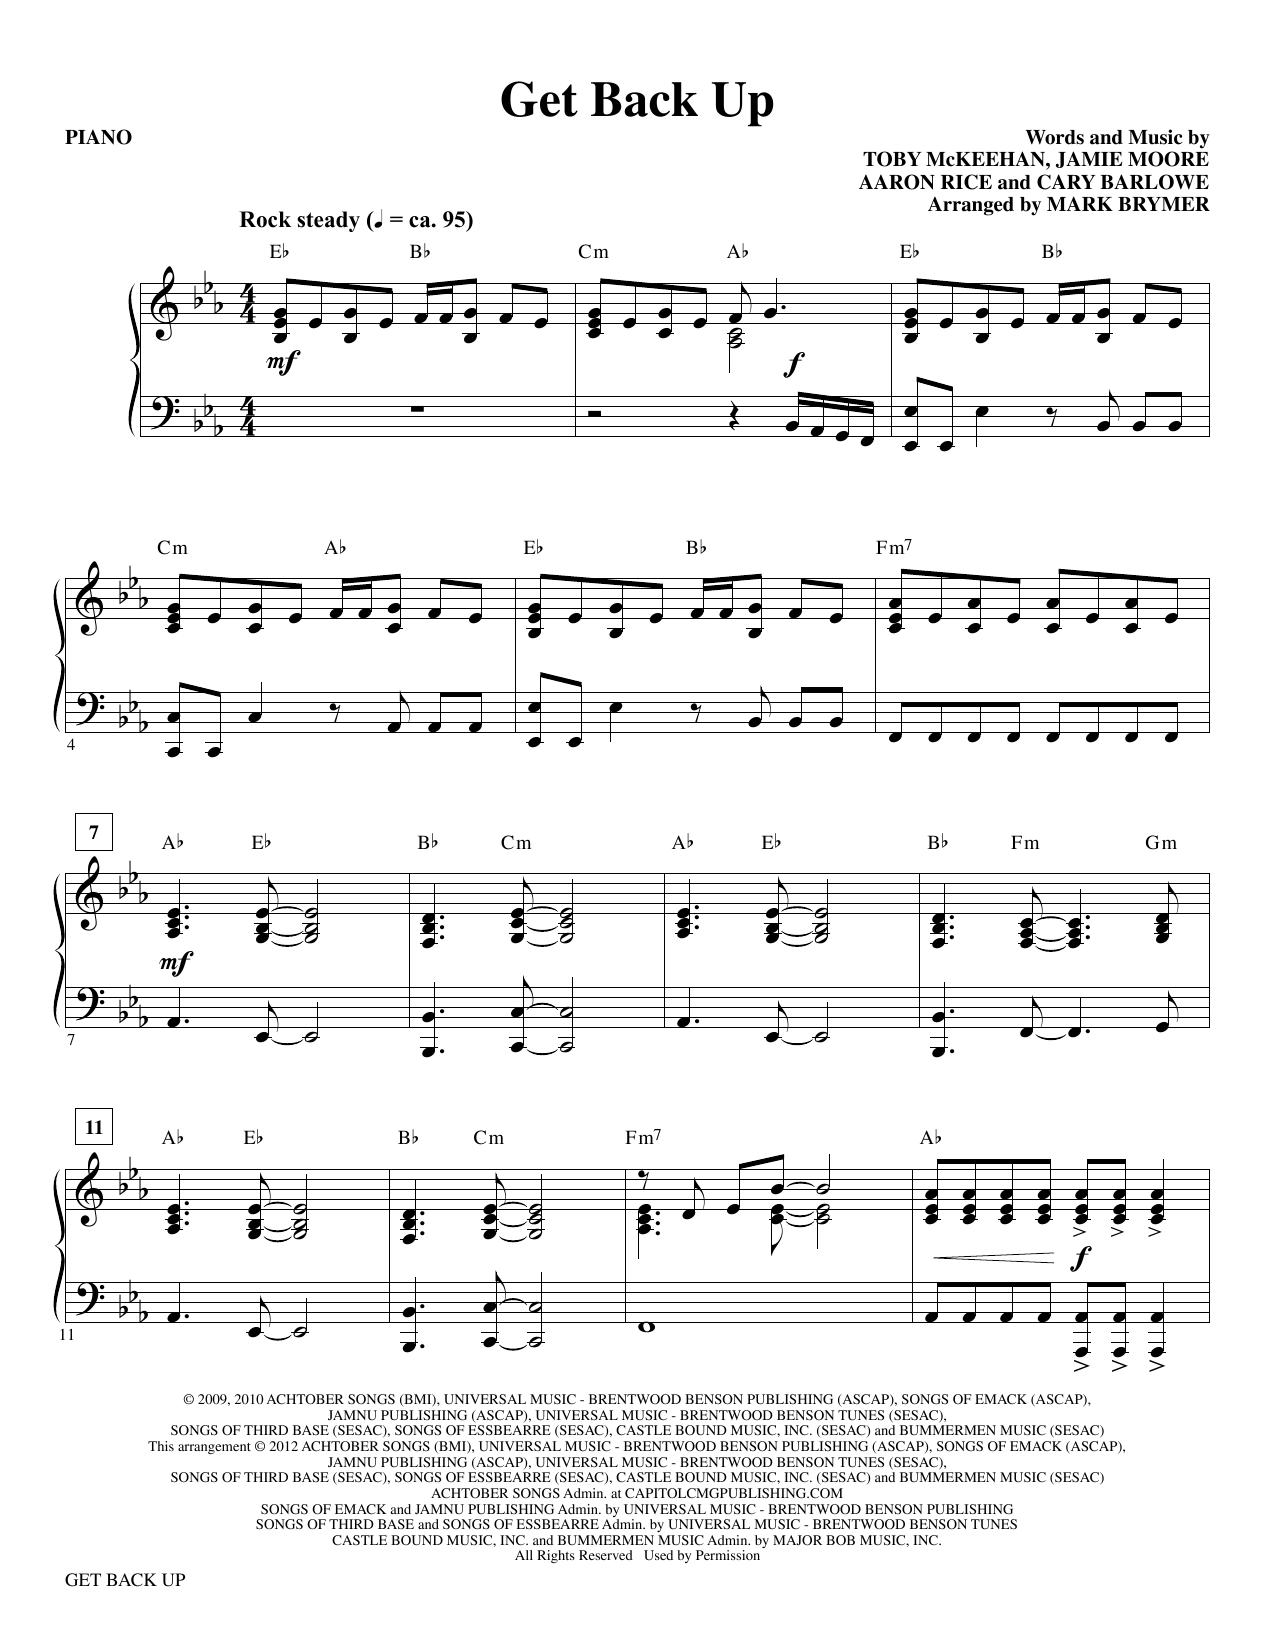 tobyMac - Get Back Up - Piano